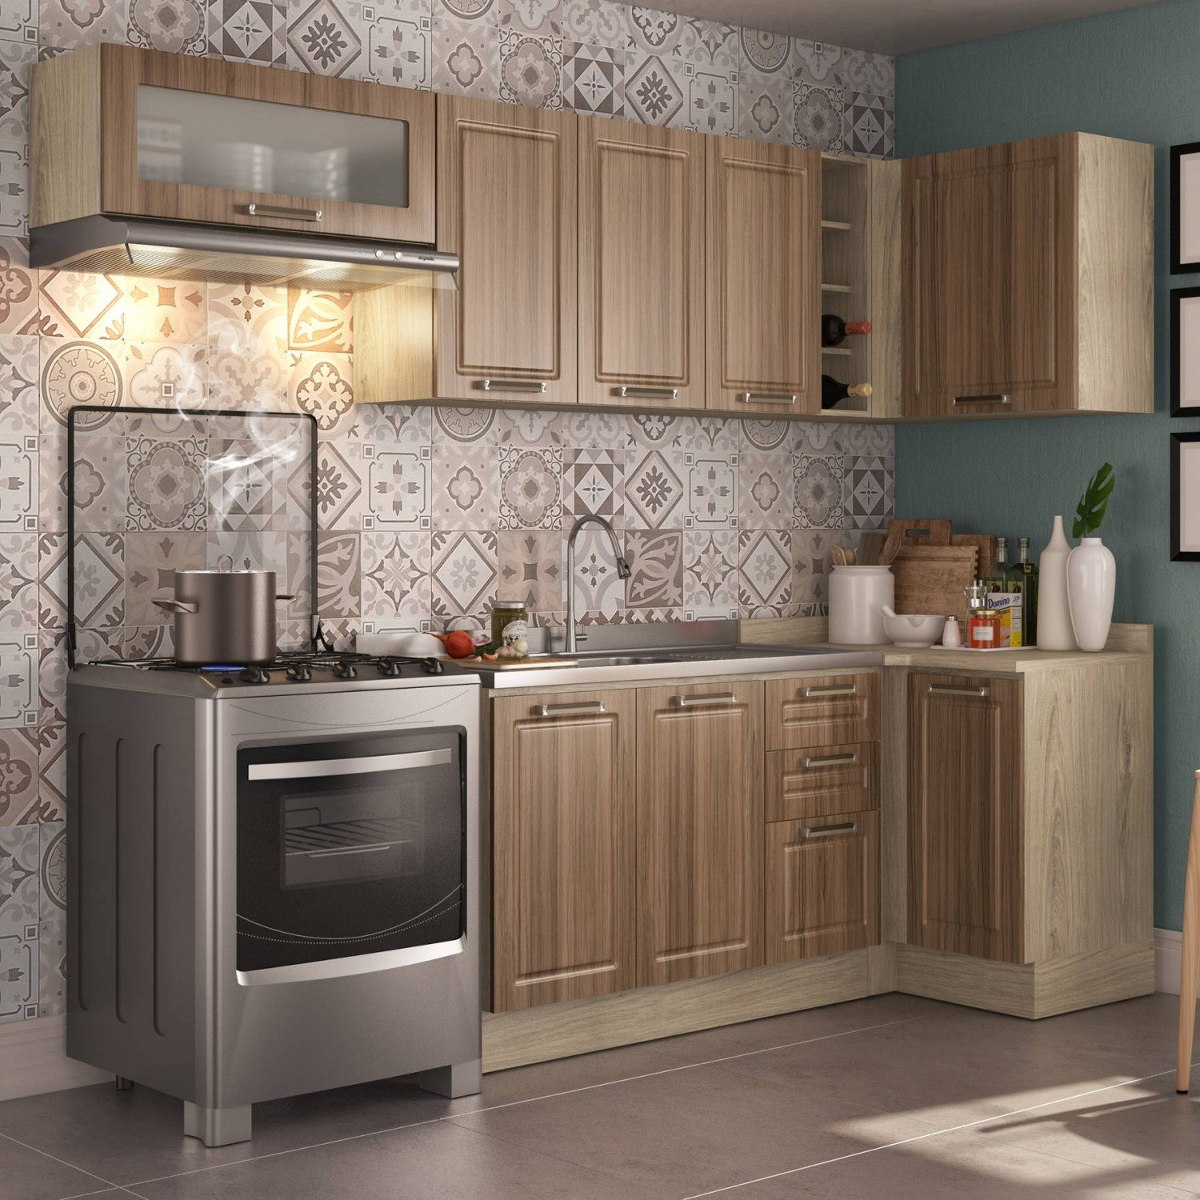 Cozinha Completa 6 M Dulos Proven Al Cook Completa Jjwt R 1 401